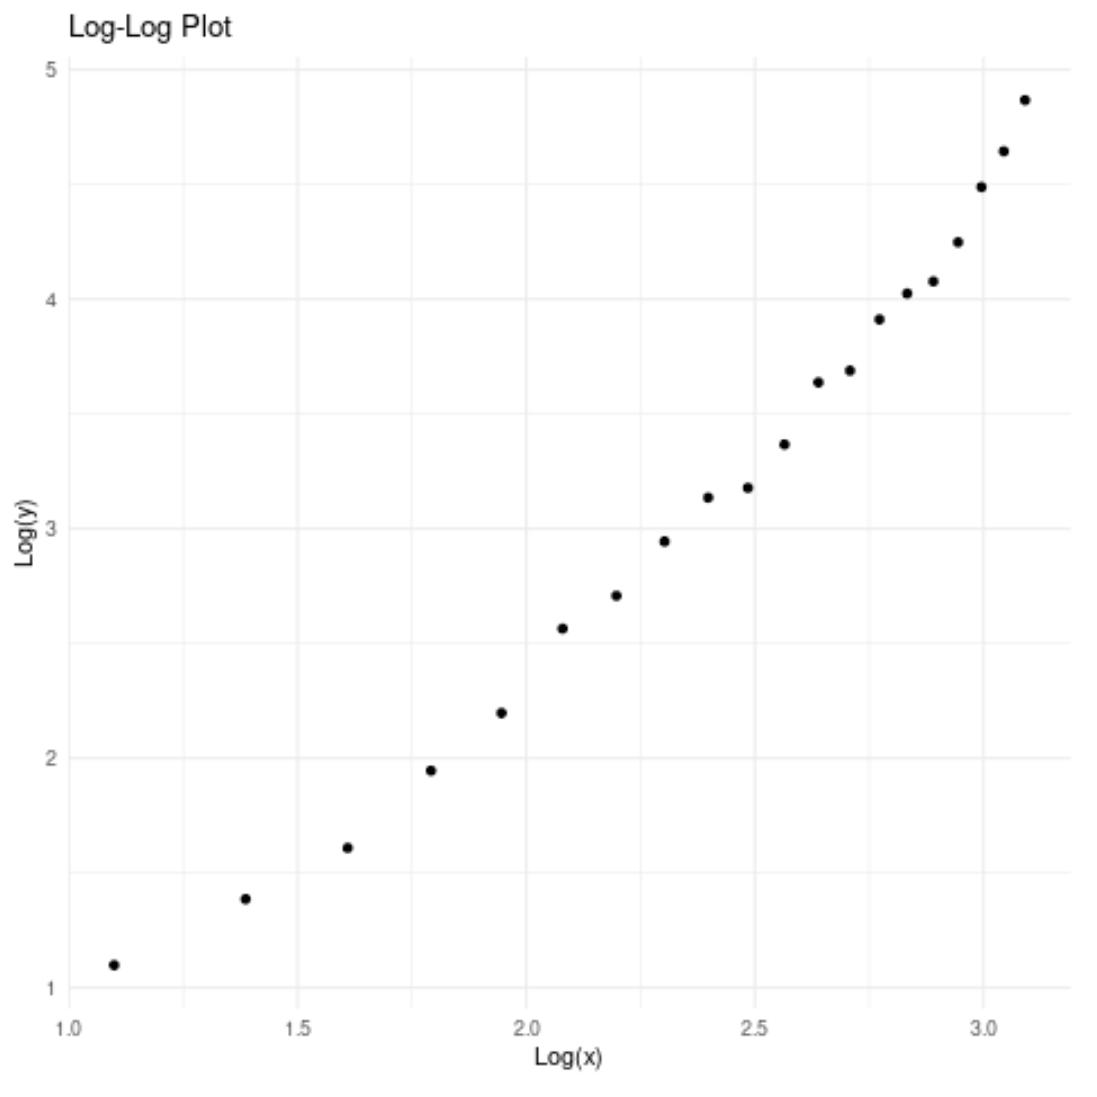 Log-log plot in R using ggplot2